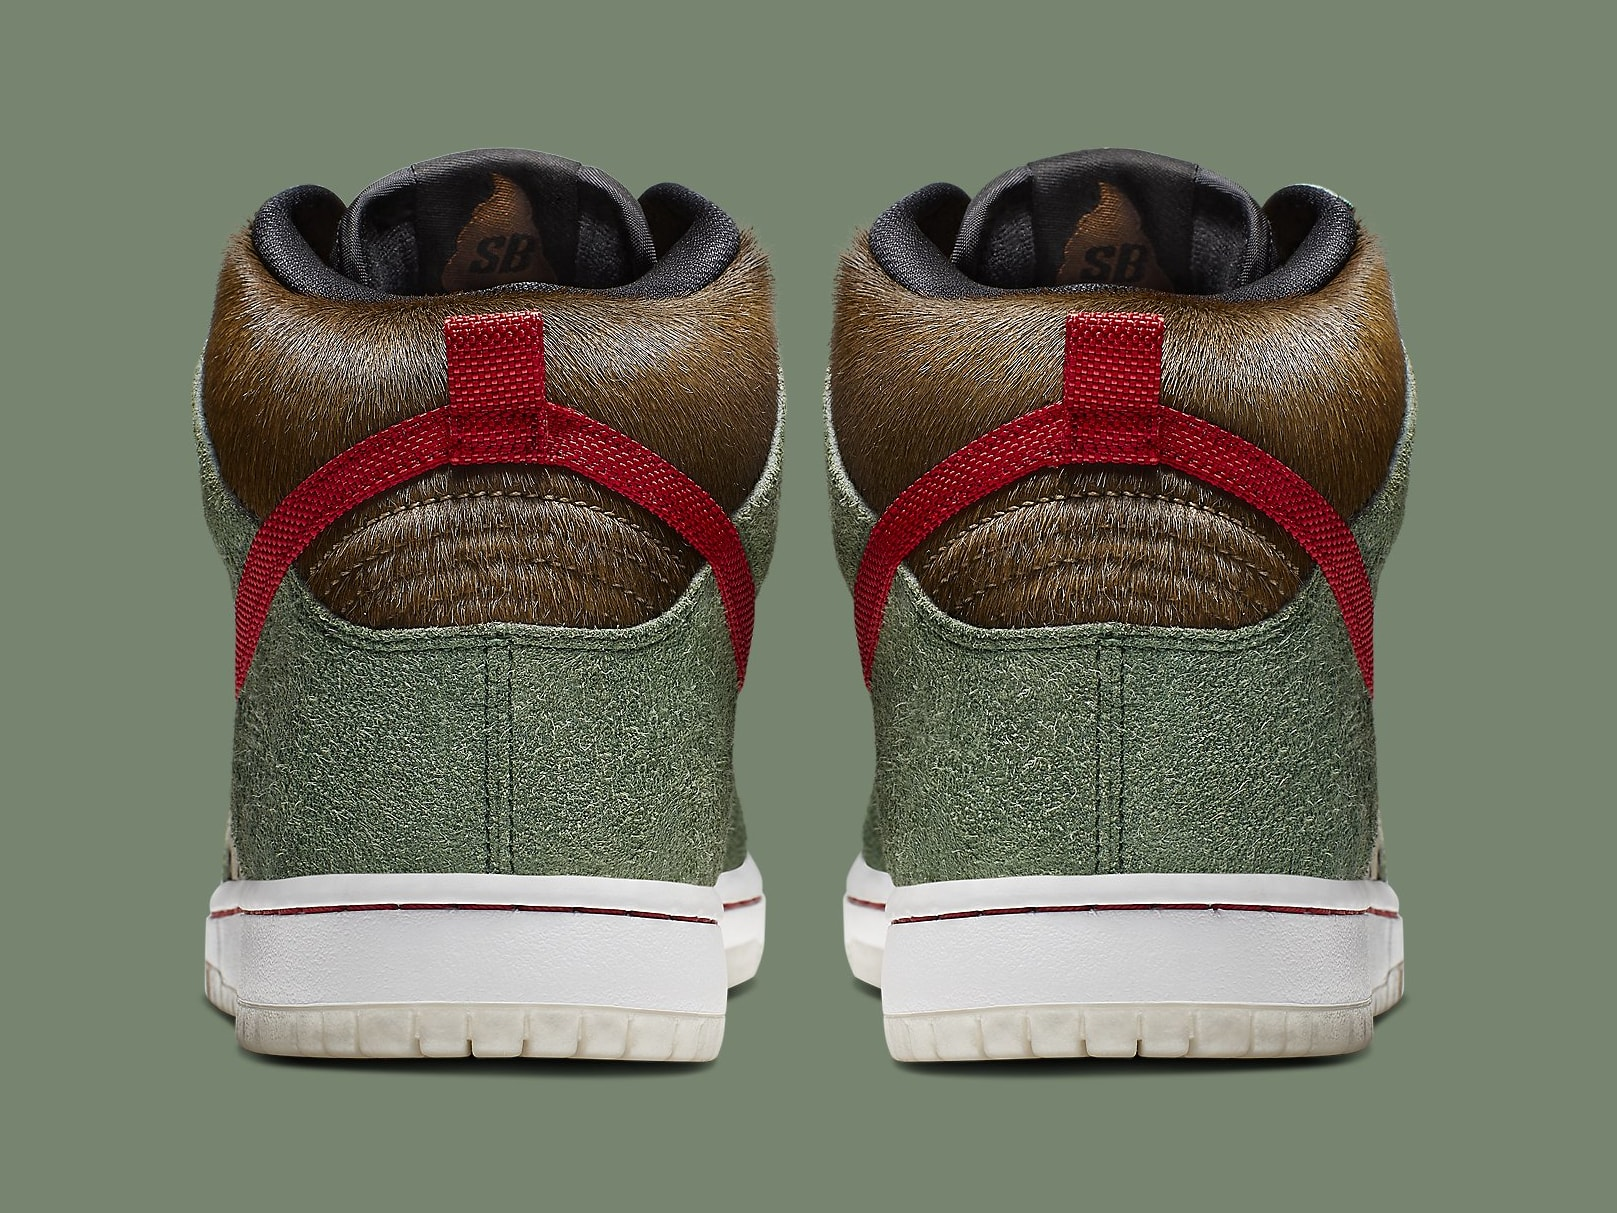 Nike SB Dunk High Dog Walker Release Date BQ6827-300 Heel